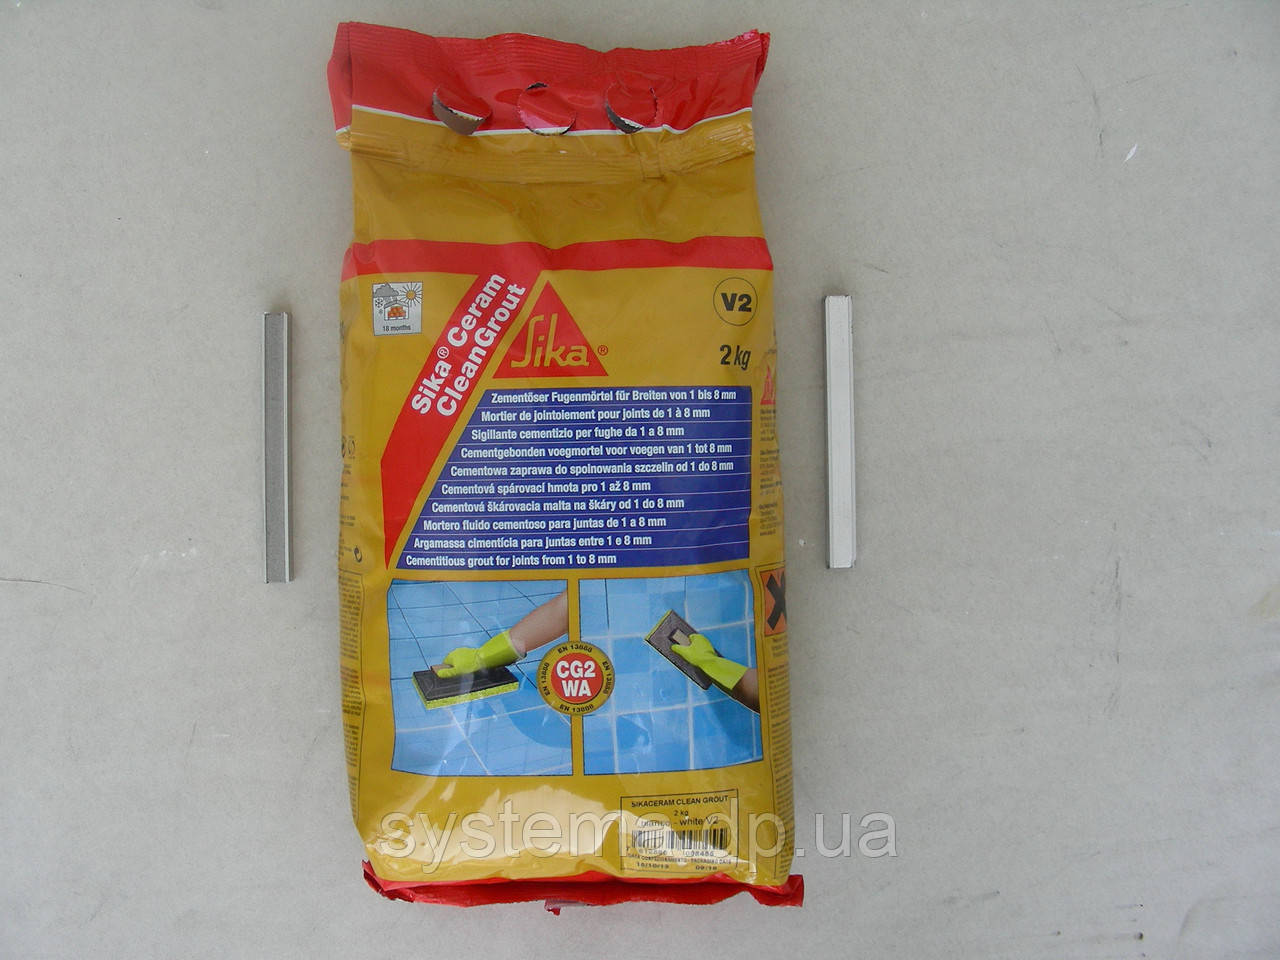 Sika®Ceram CleanGrout - затирка для швов в плитке, серый, 2 кг